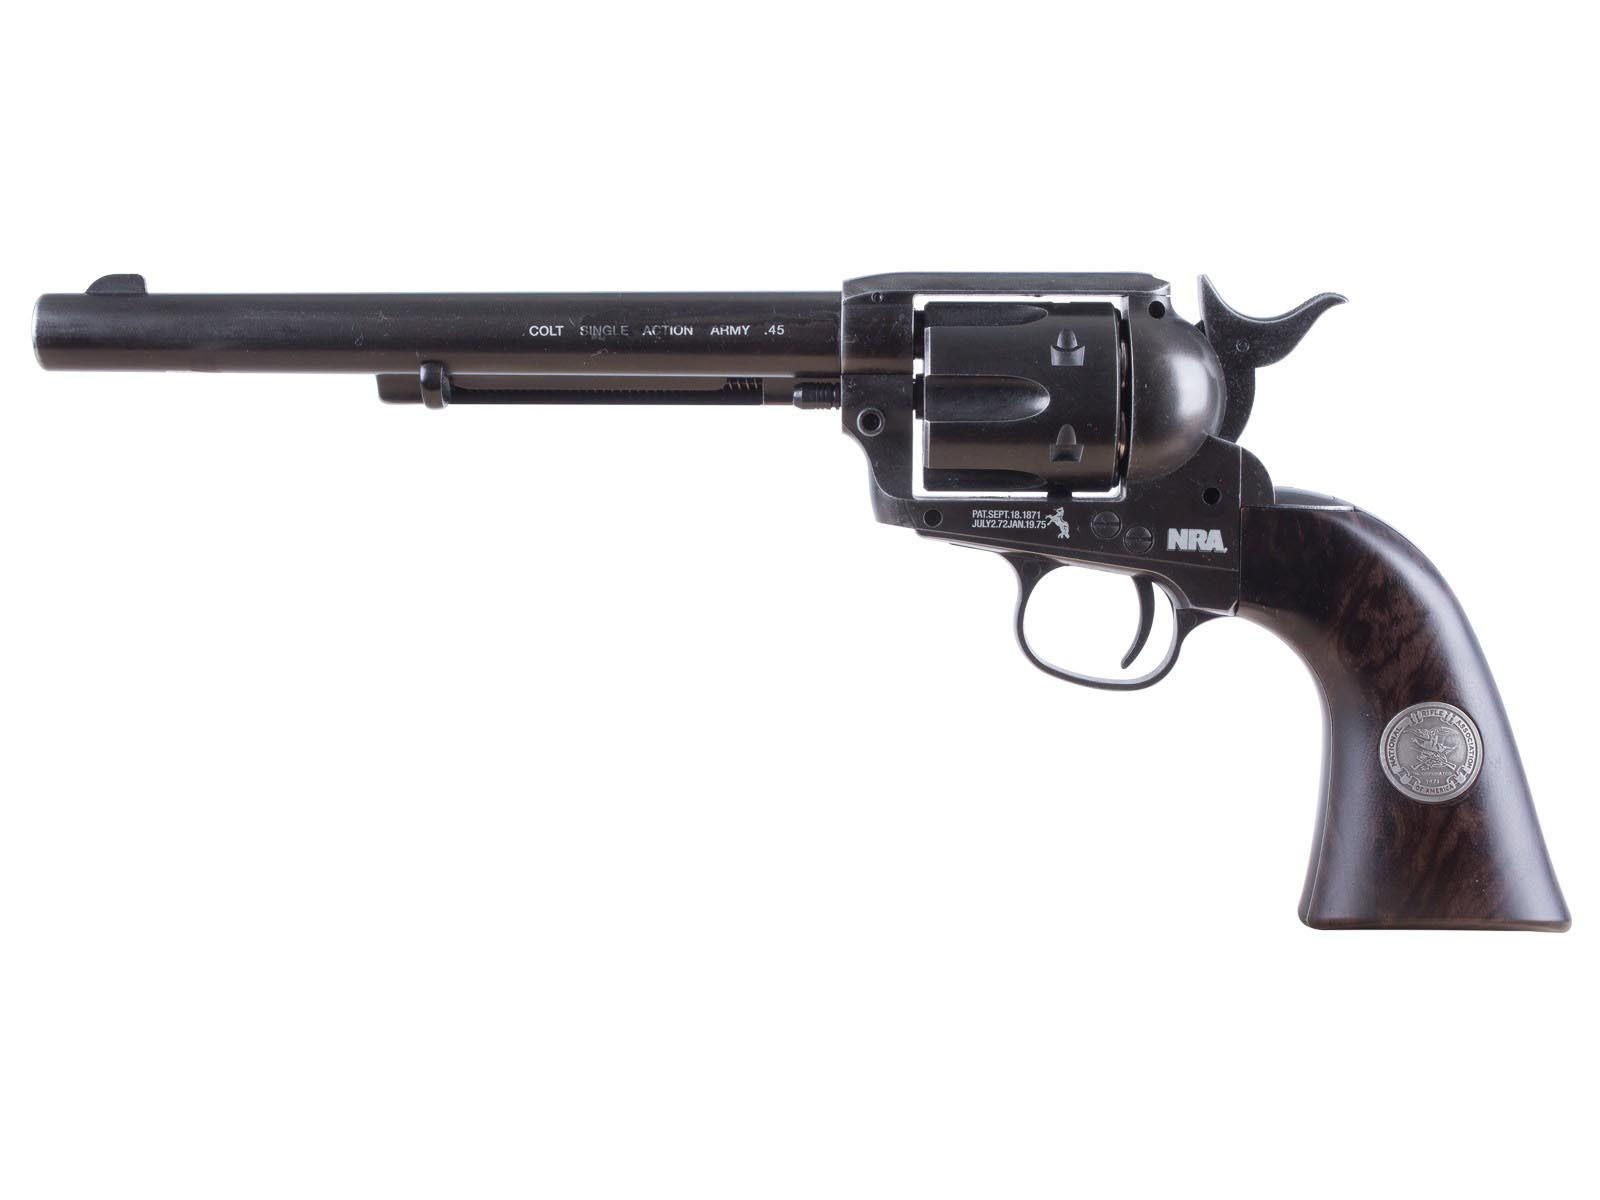 "Colt NRA Peacemaker 7.5"" Pellet Revolver"